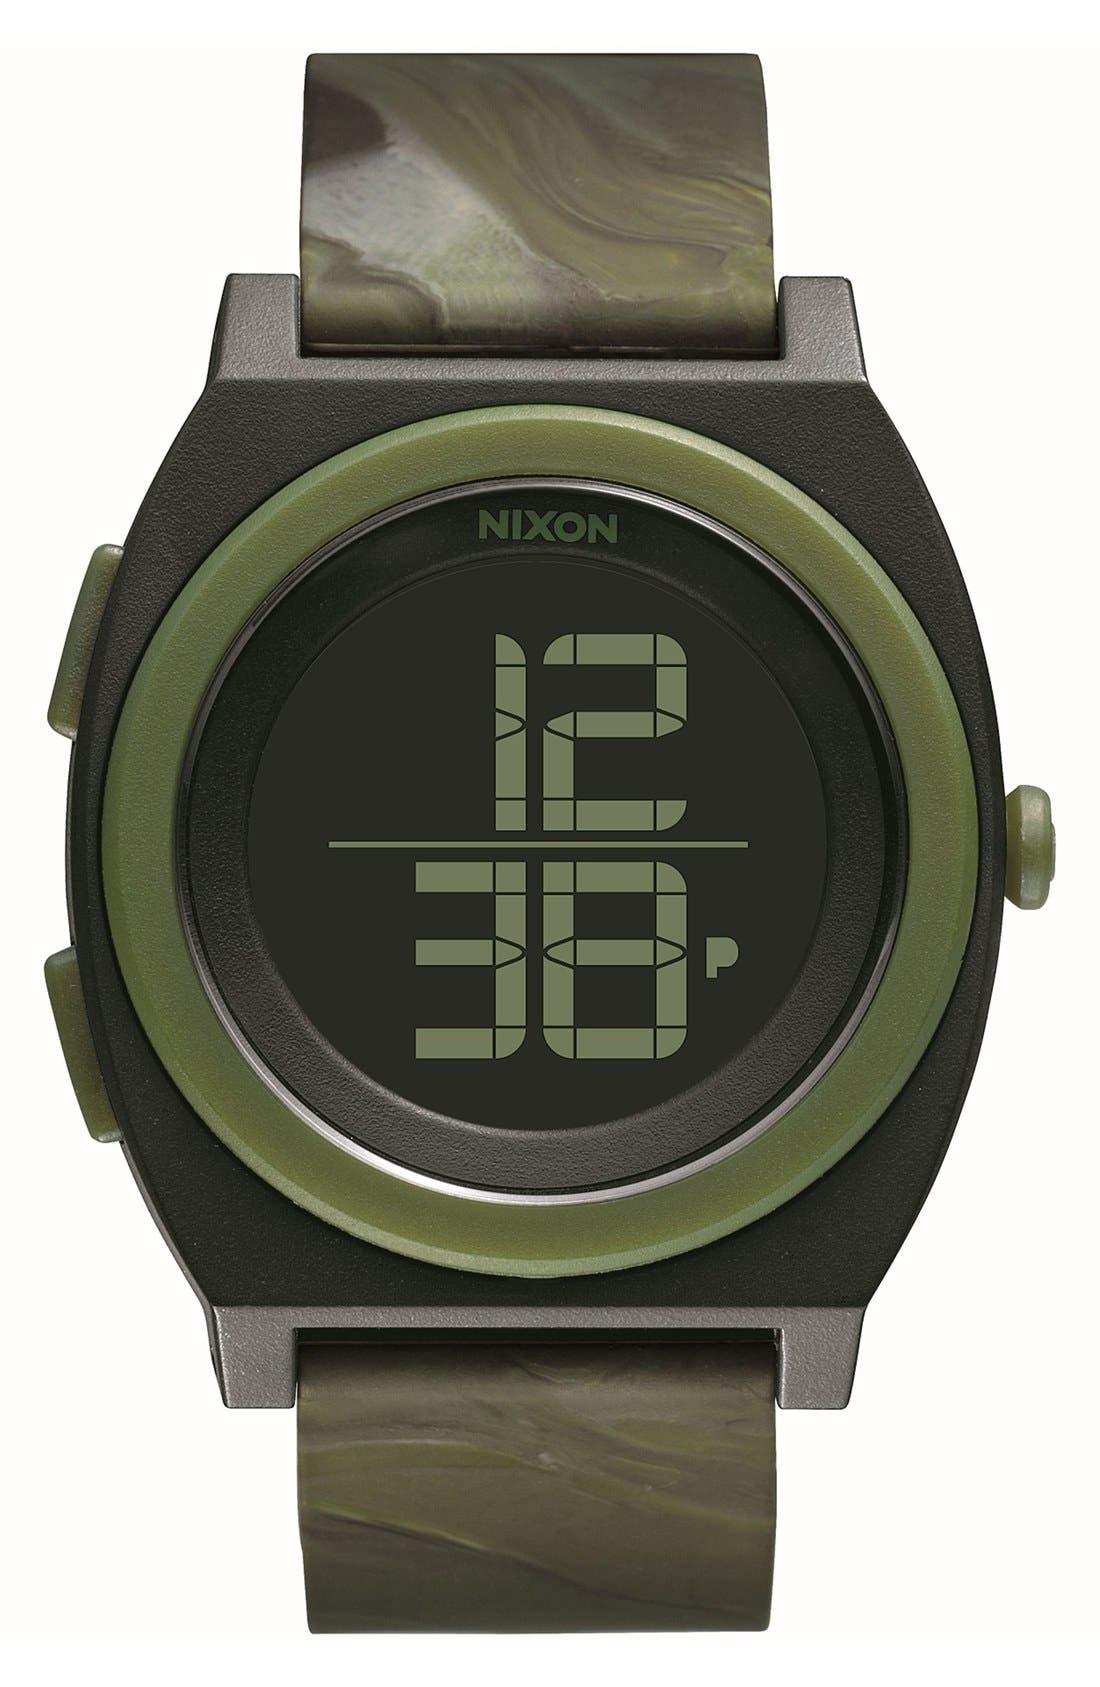 Main Image - Nixon 'Time Teller' Digital Watch, 40mm